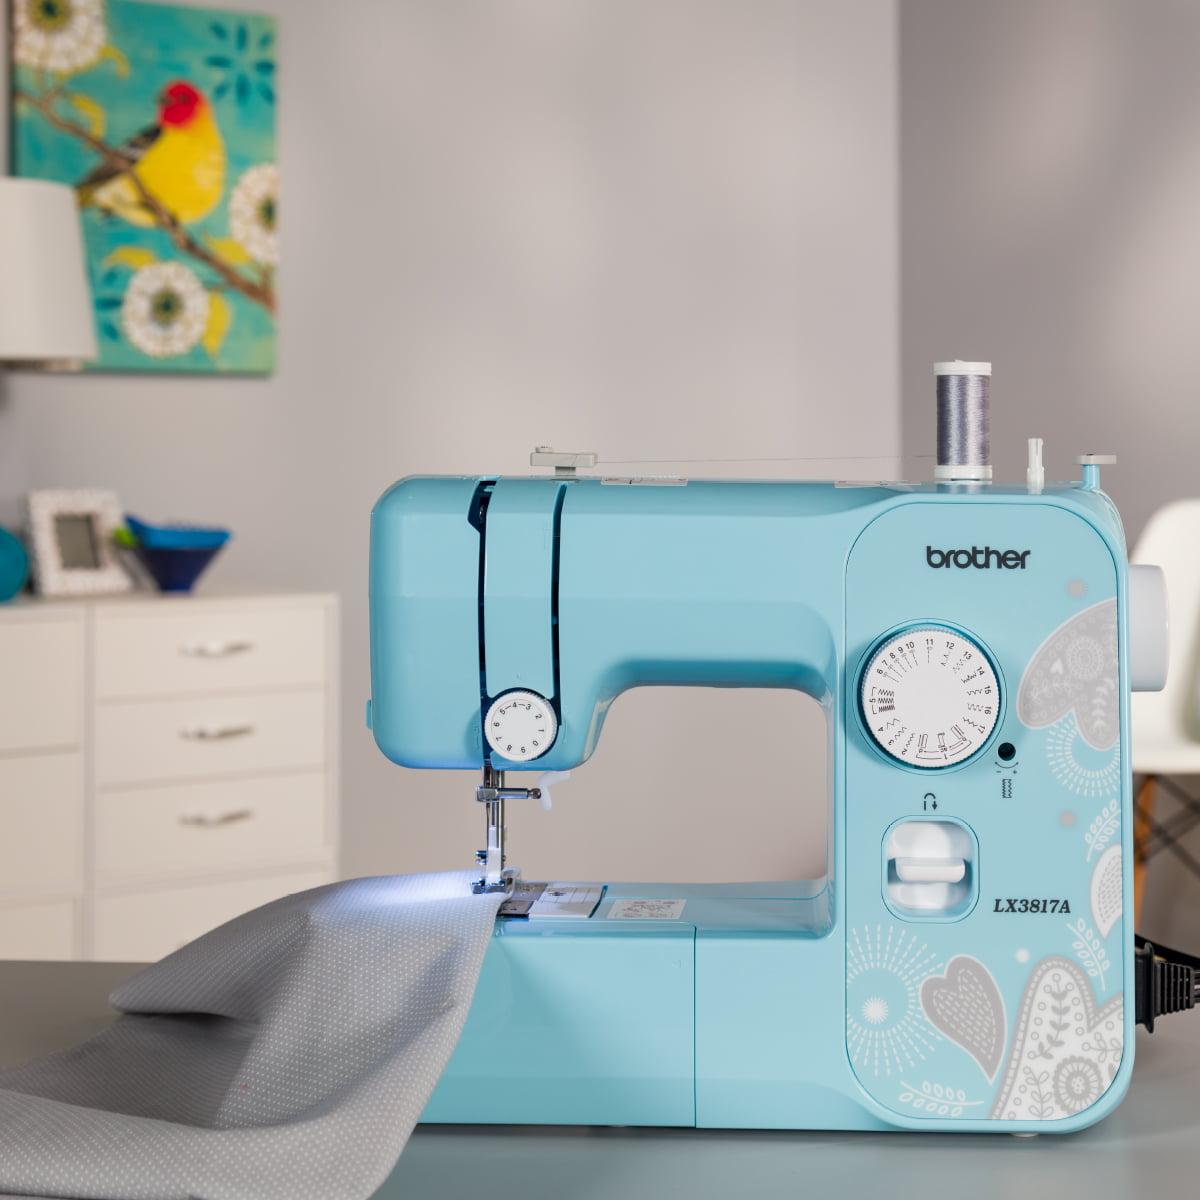 Brother Full-Size Sewing Machine 17 Stitch LX3817A